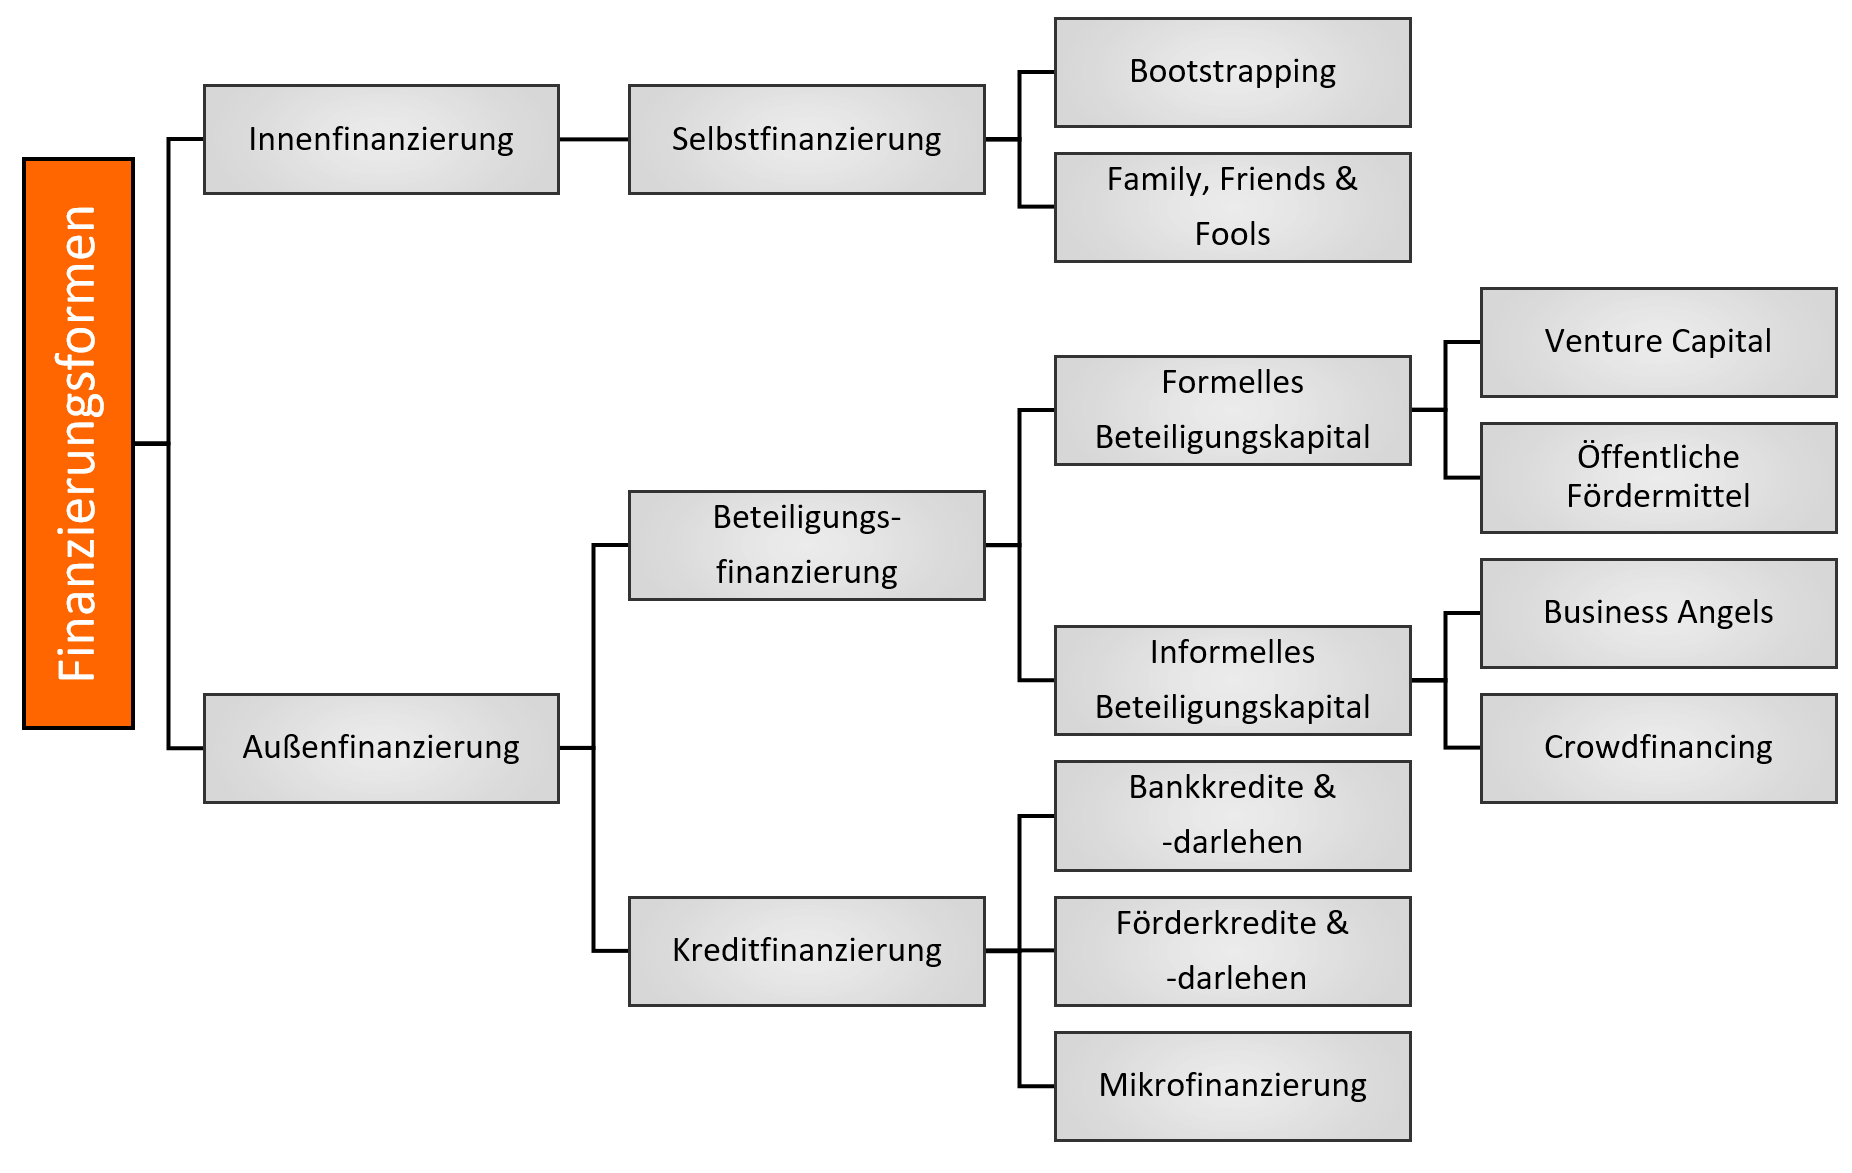 Bootstrapping Finanzierungsform